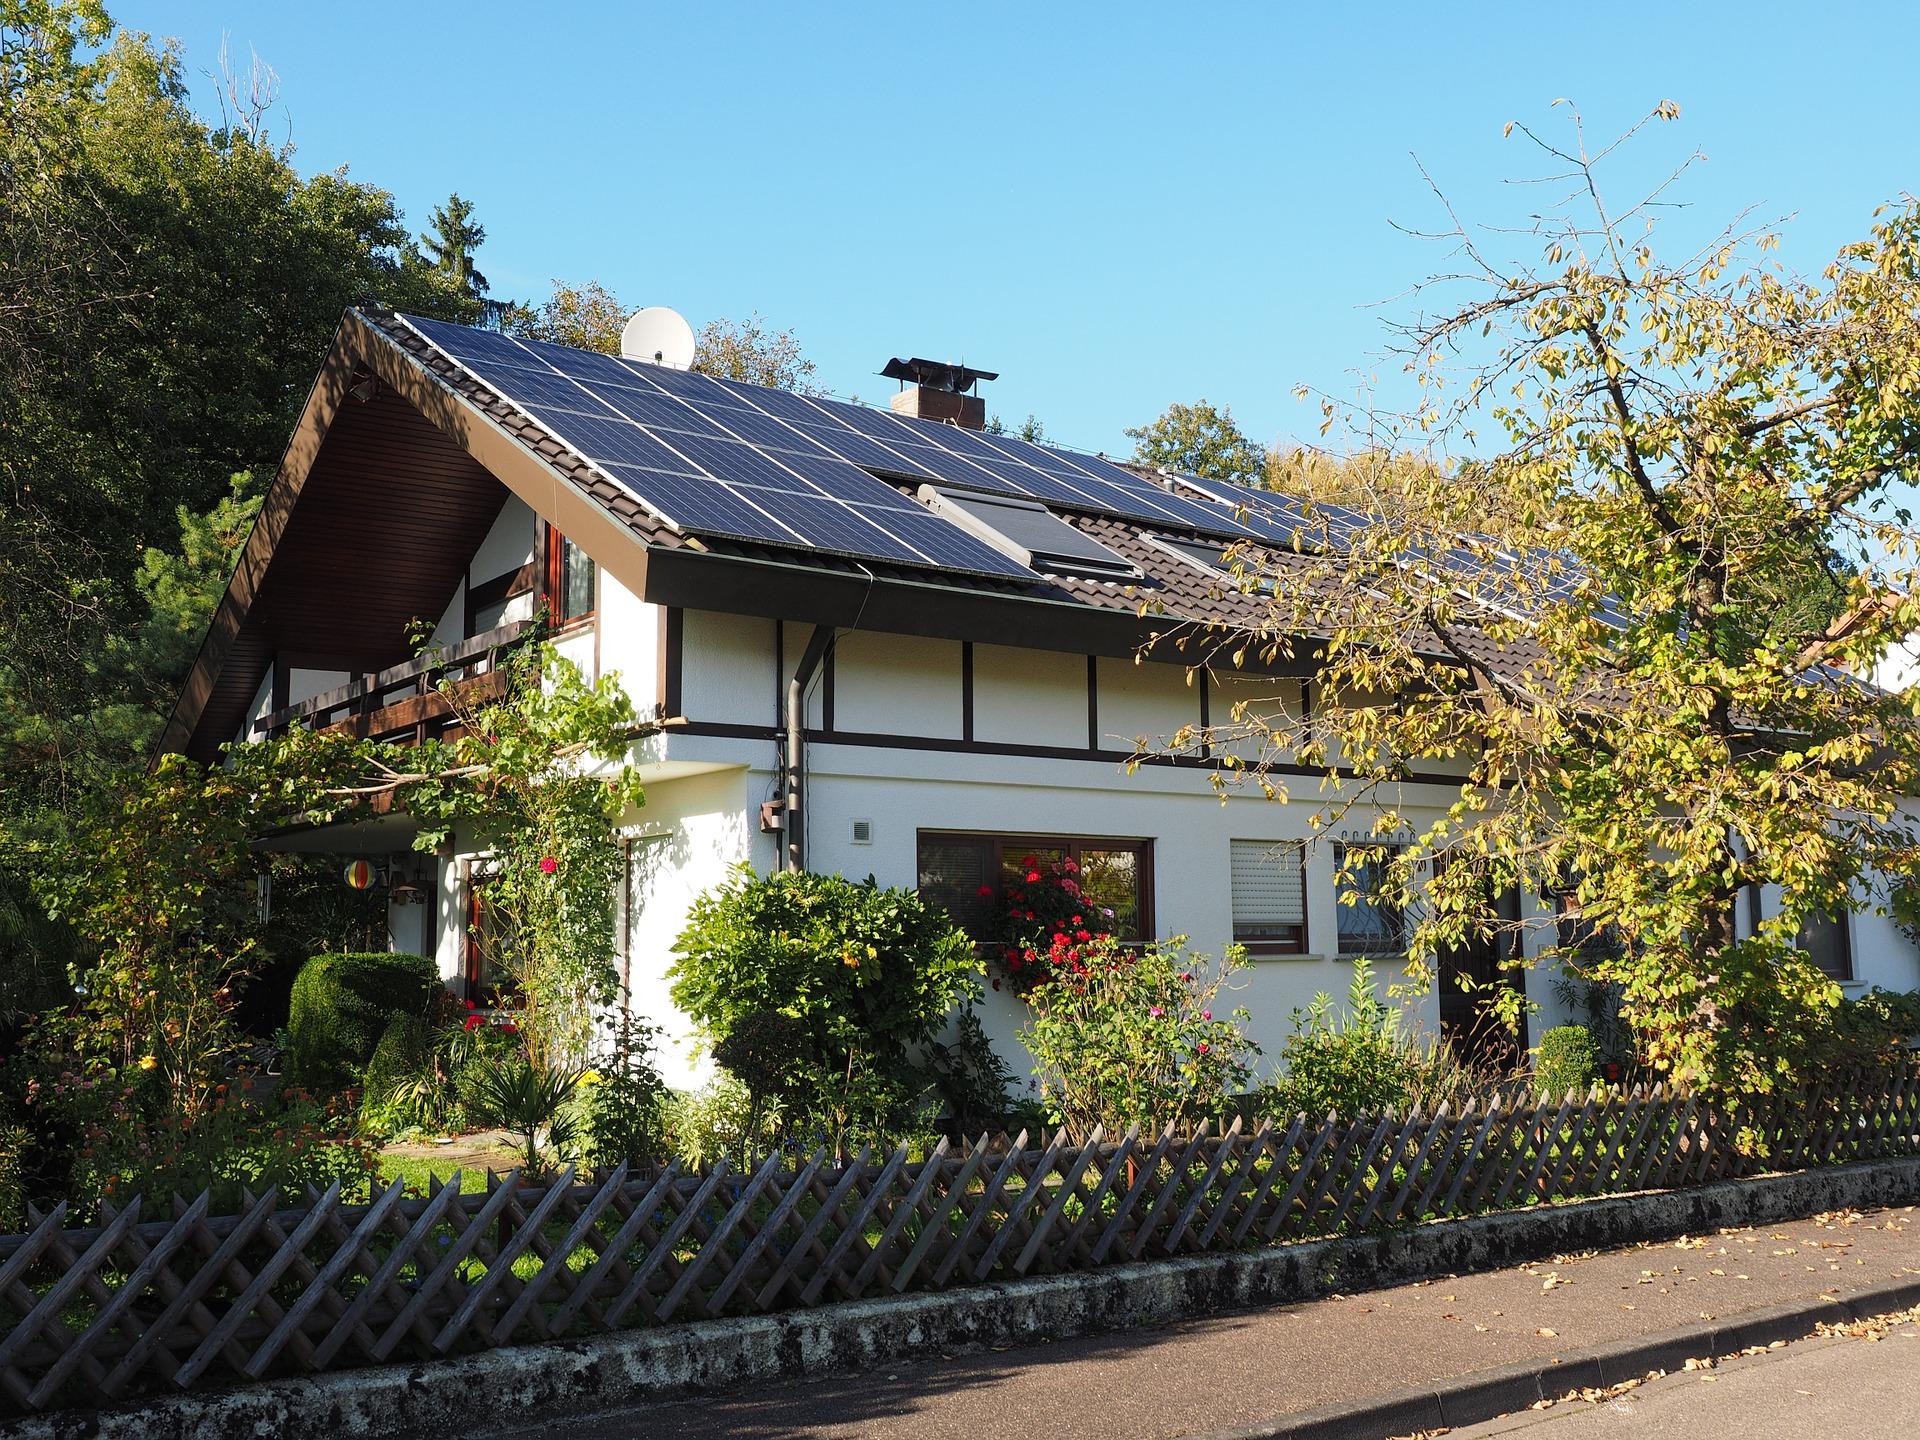 Solarzellendach